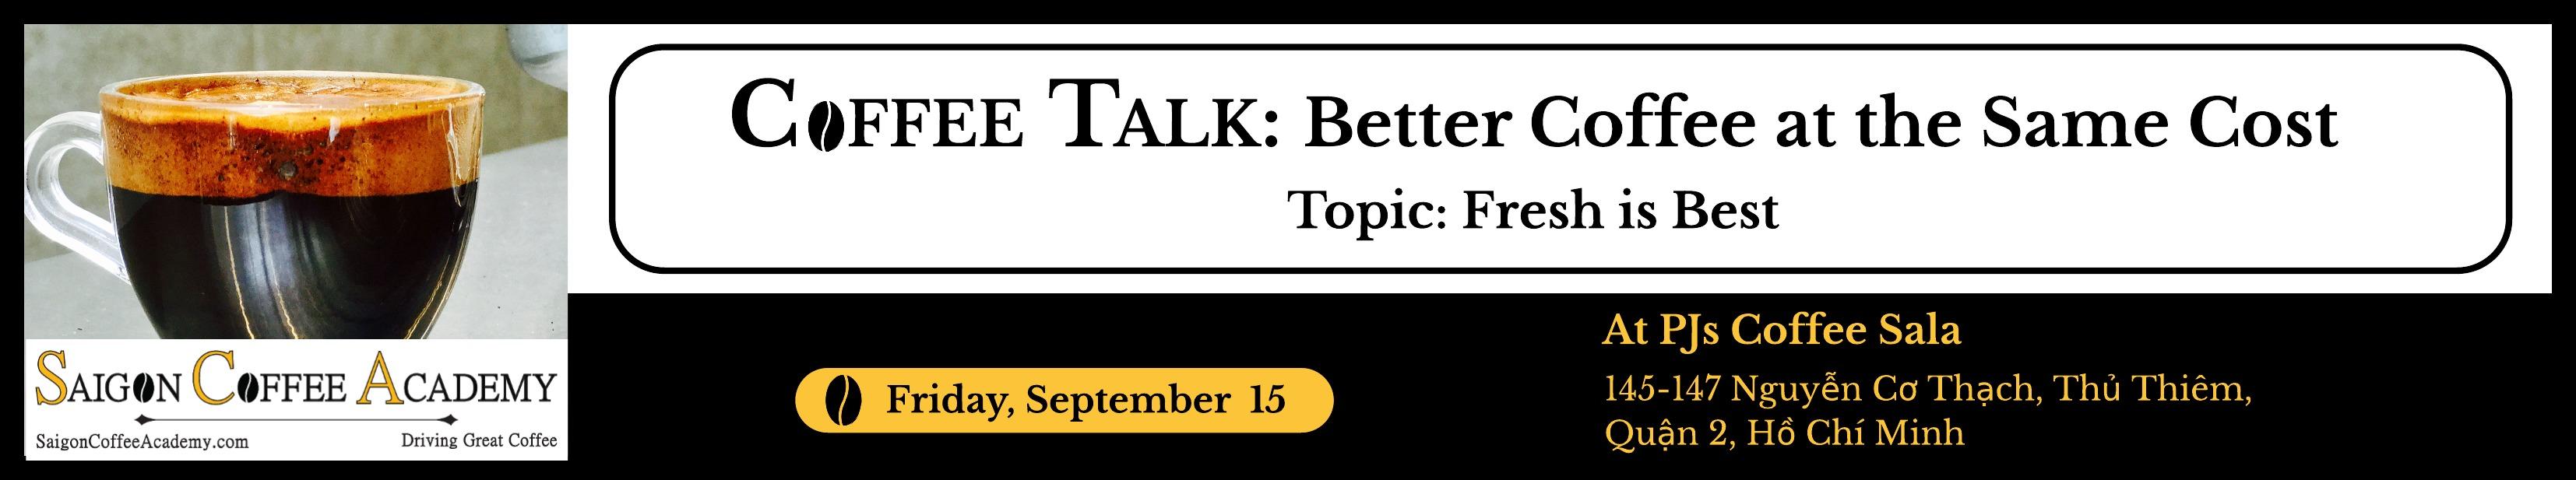 coffee-talk-15-sept.jpg